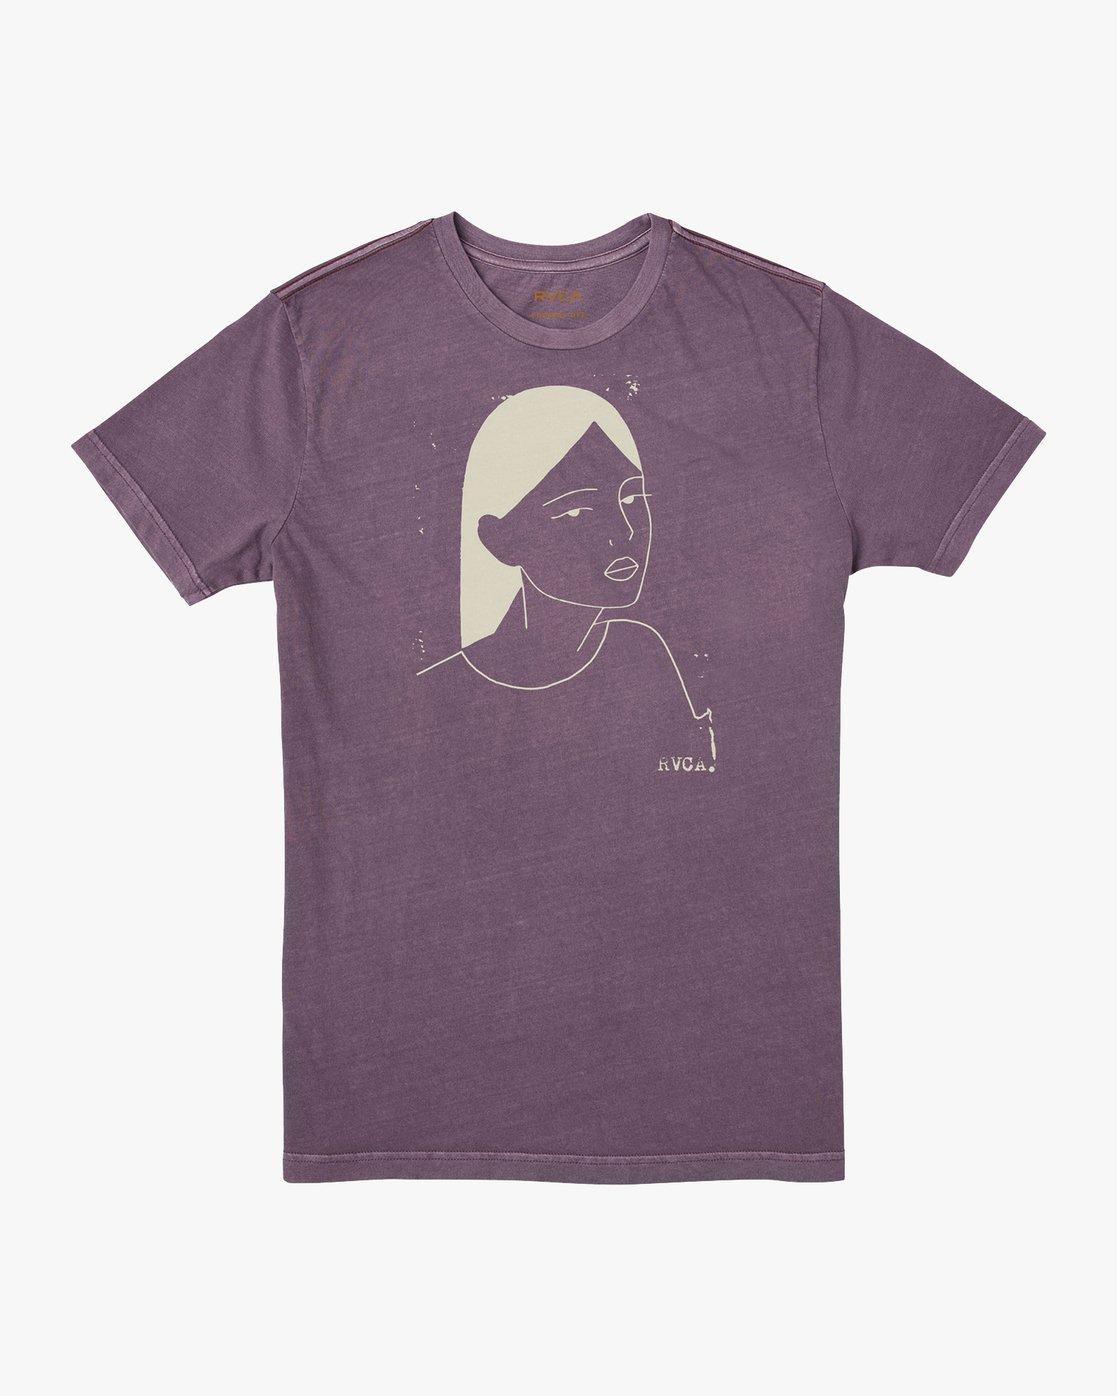 0 Johanna Olk Frosty Gaze T-Shirt Purple M438URFR RVCA